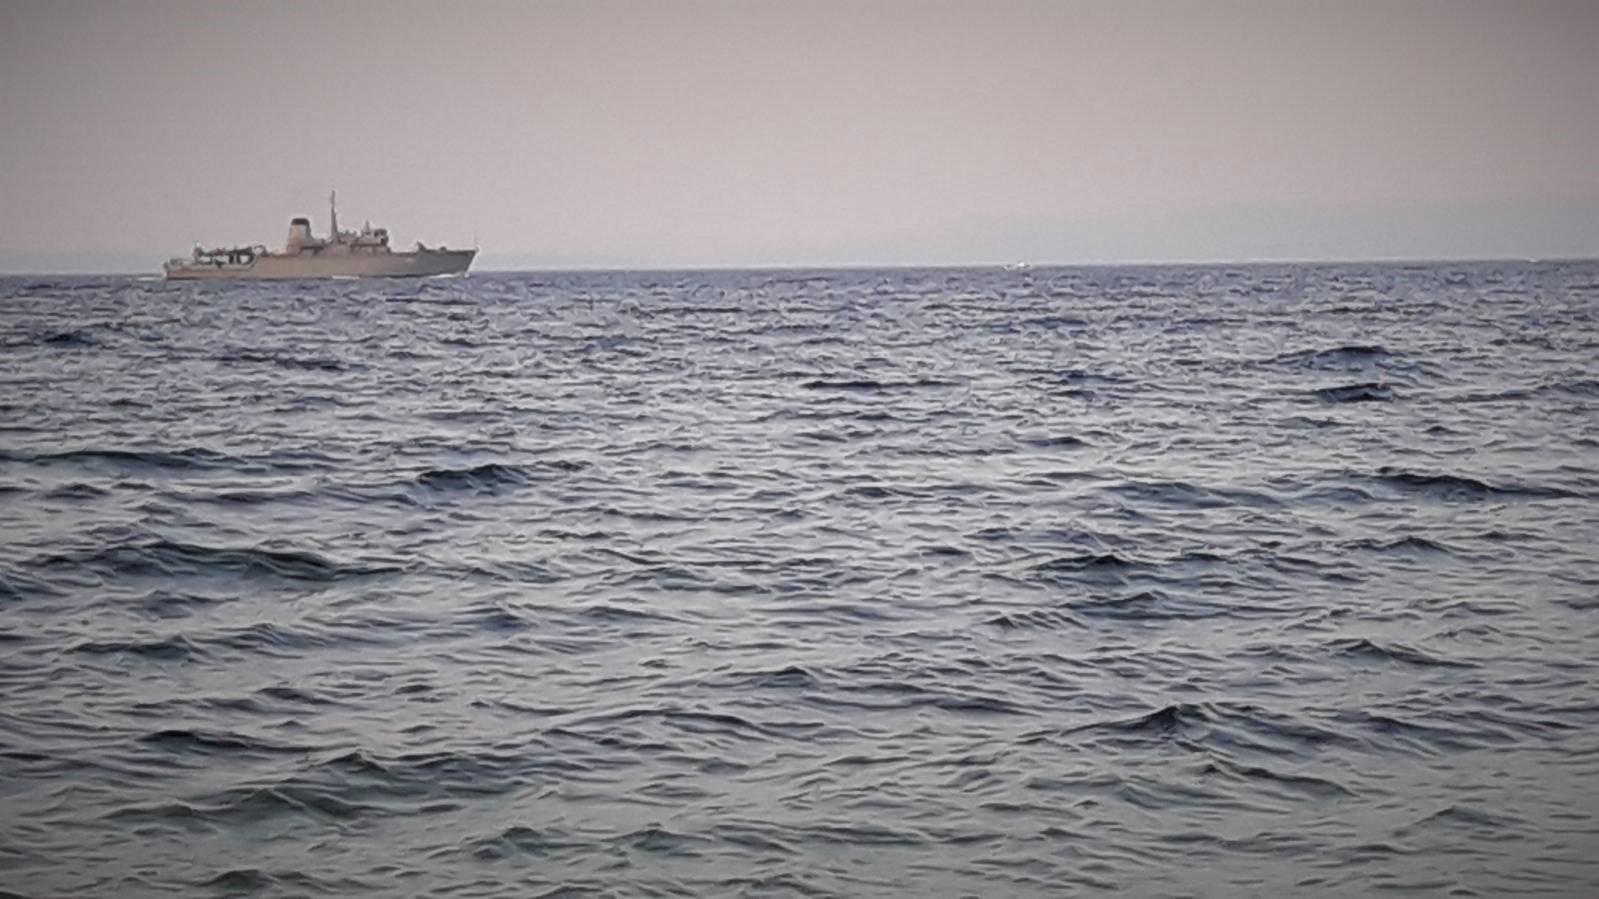 Hellenic Coast Guard vessel patrolling the Aegean Sea off the coast of Lesvos island.